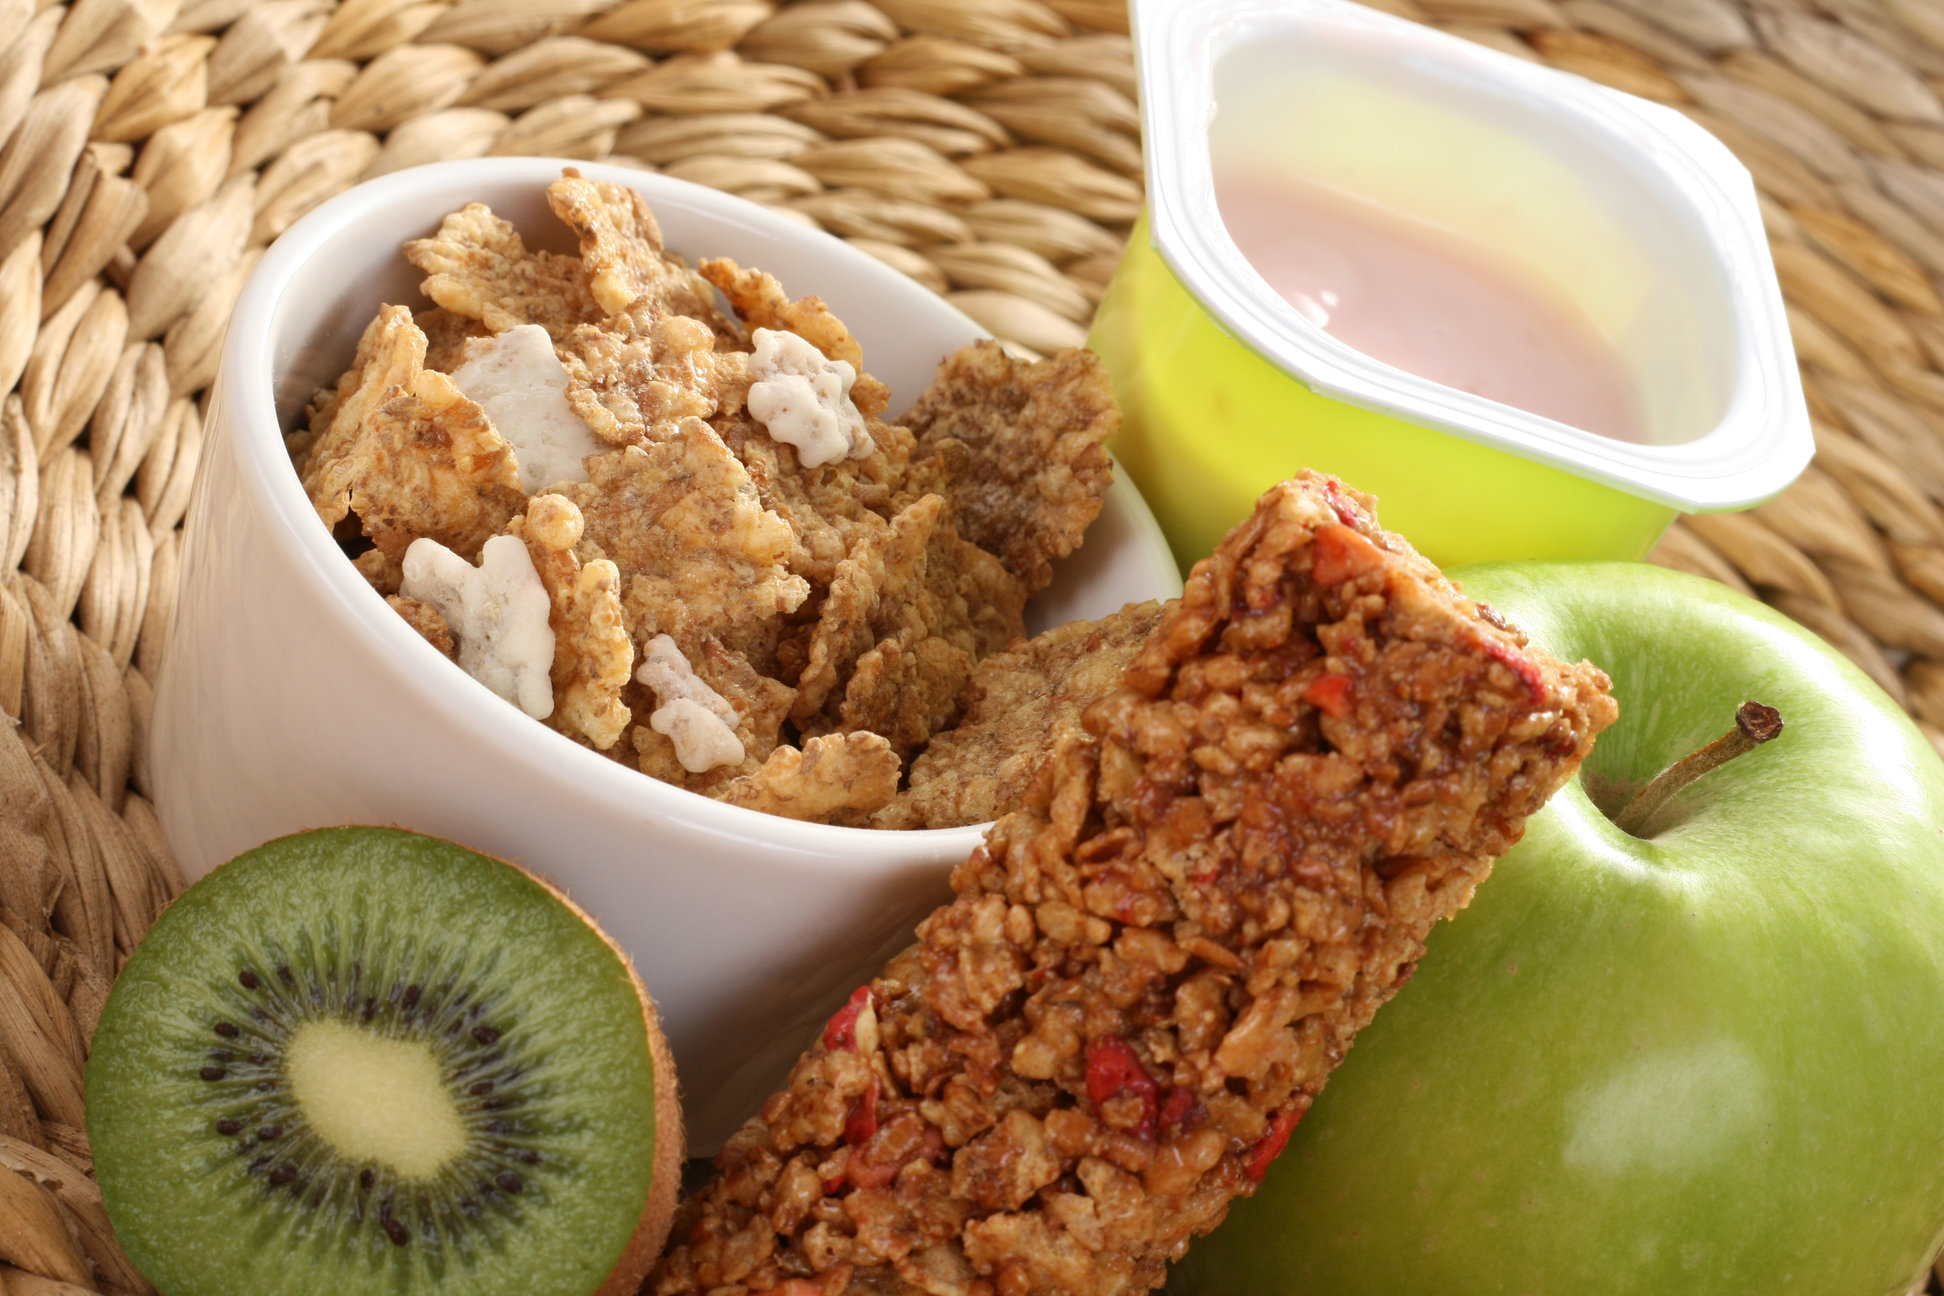 rsz_healthy_snacks3